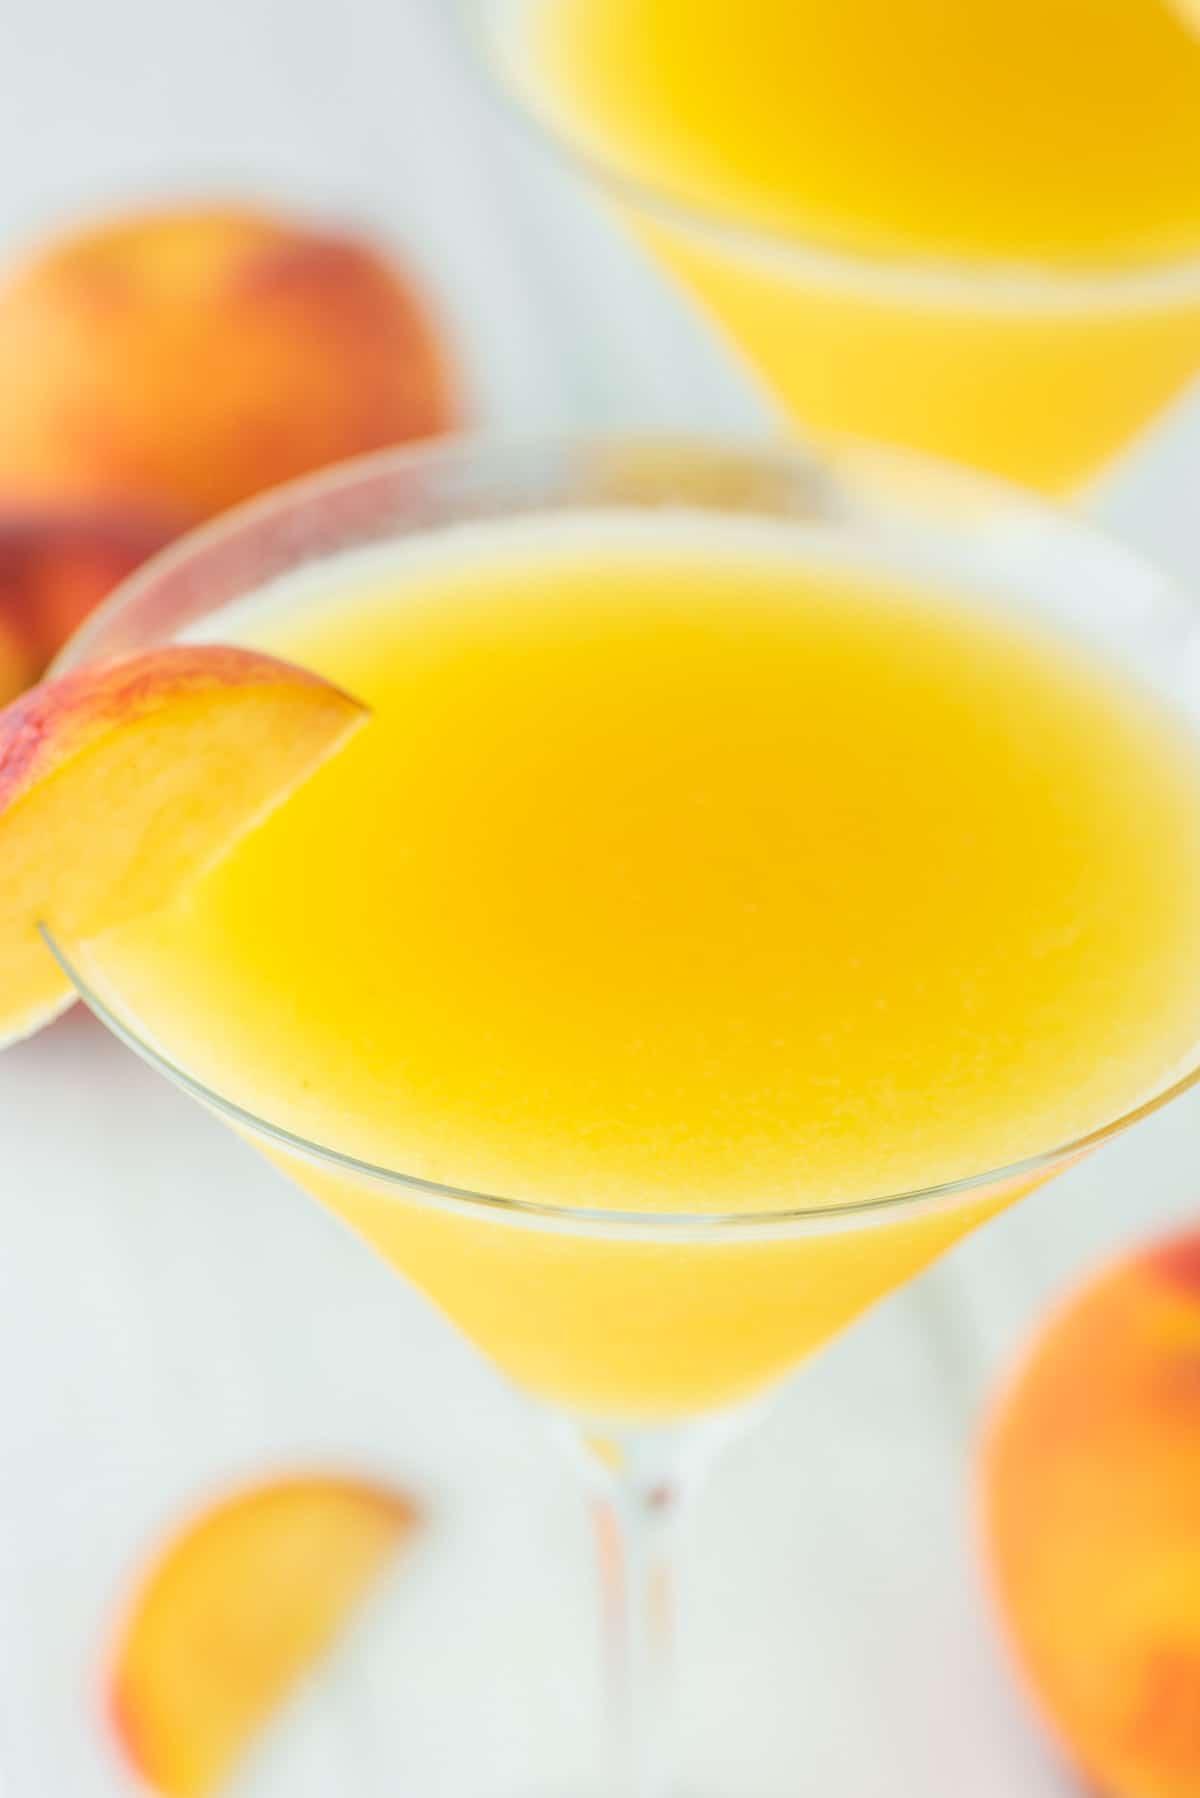 glass of peach martini with slice of peach